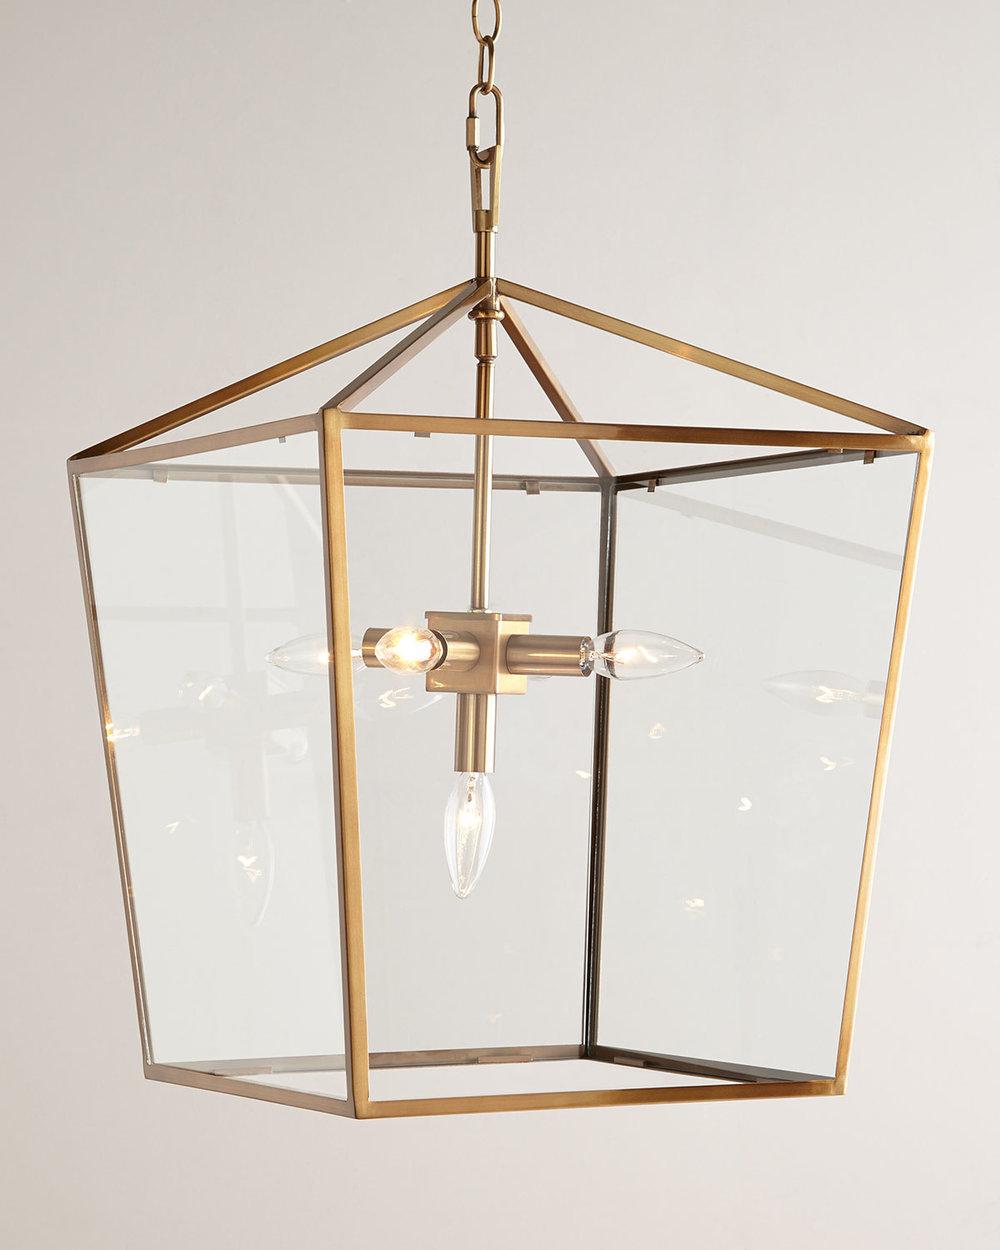 regina andrew design camden 5-light lantern horchow—20% off sitewide